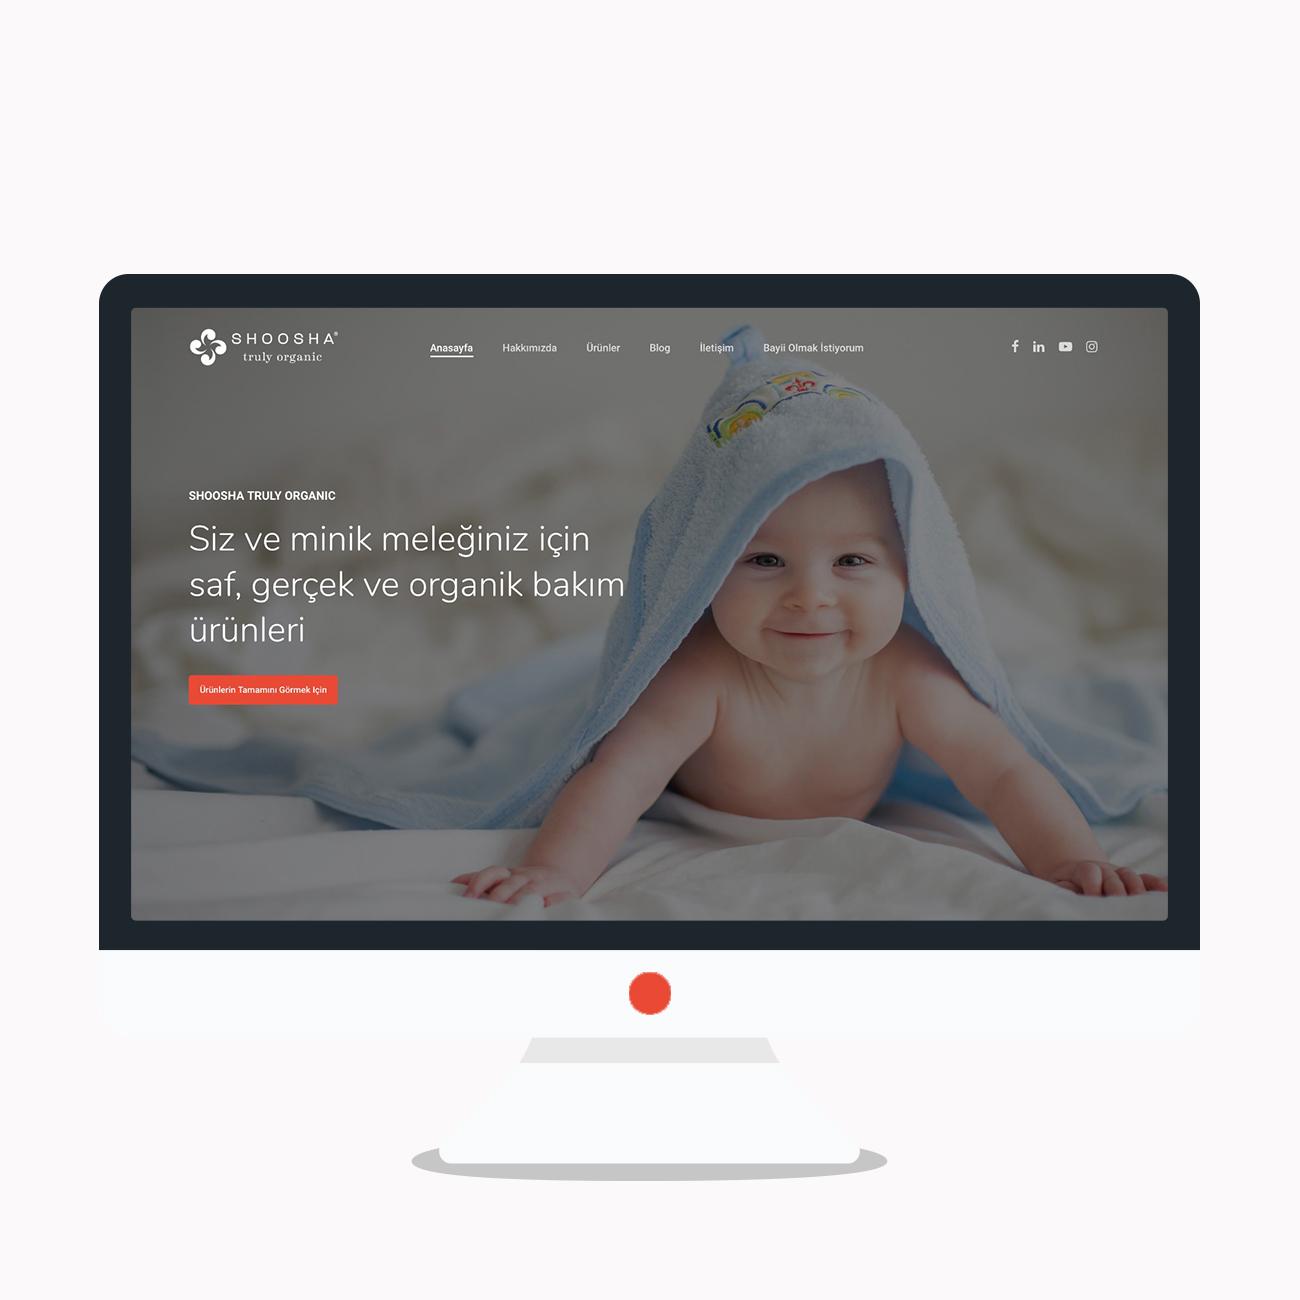 Gunery Media Web Design beauty baby care shoosha Desktop